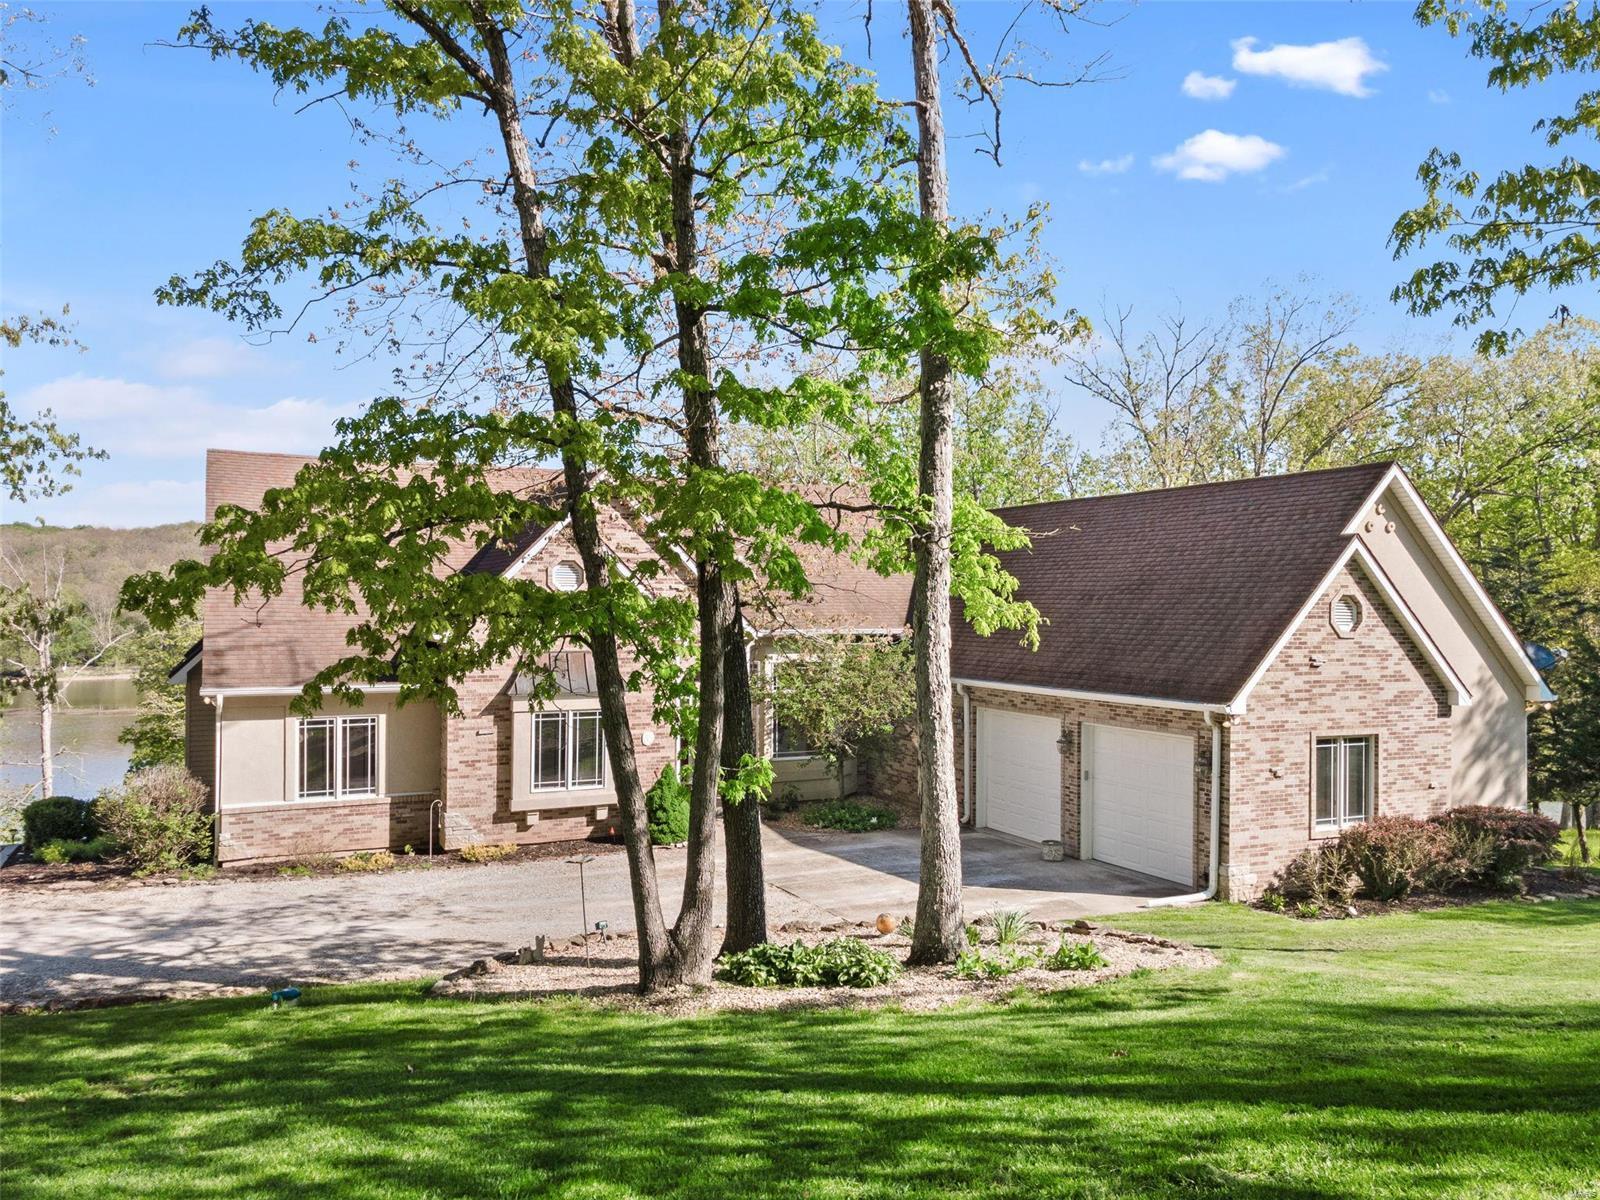 30591 Astrid Loop Property Photo - Edwards, MO real estate listing